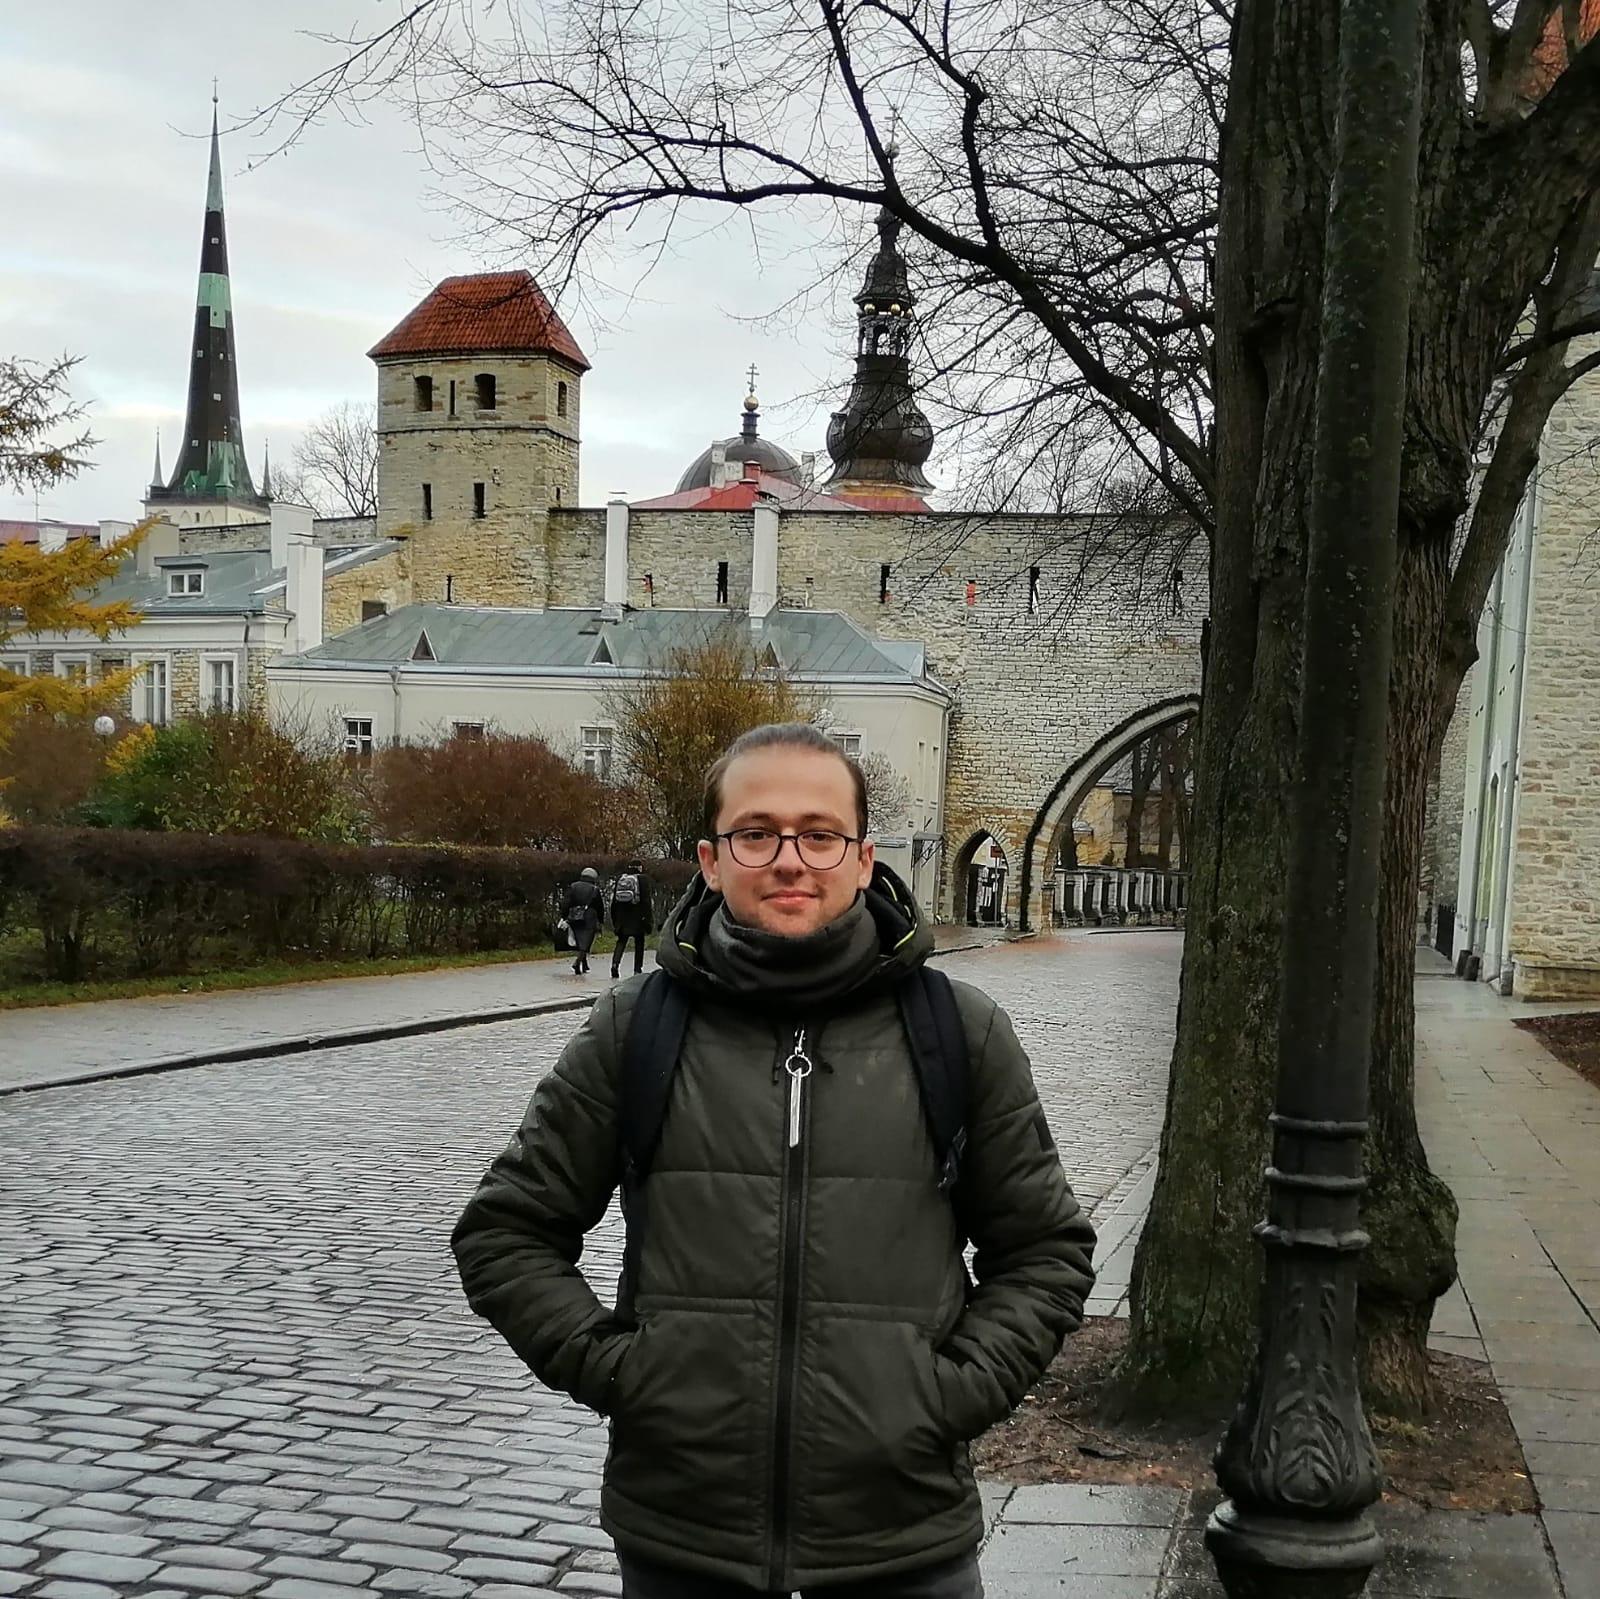 cagatay cay turkey solidarity corps eesti estonia hoolekandeteenused